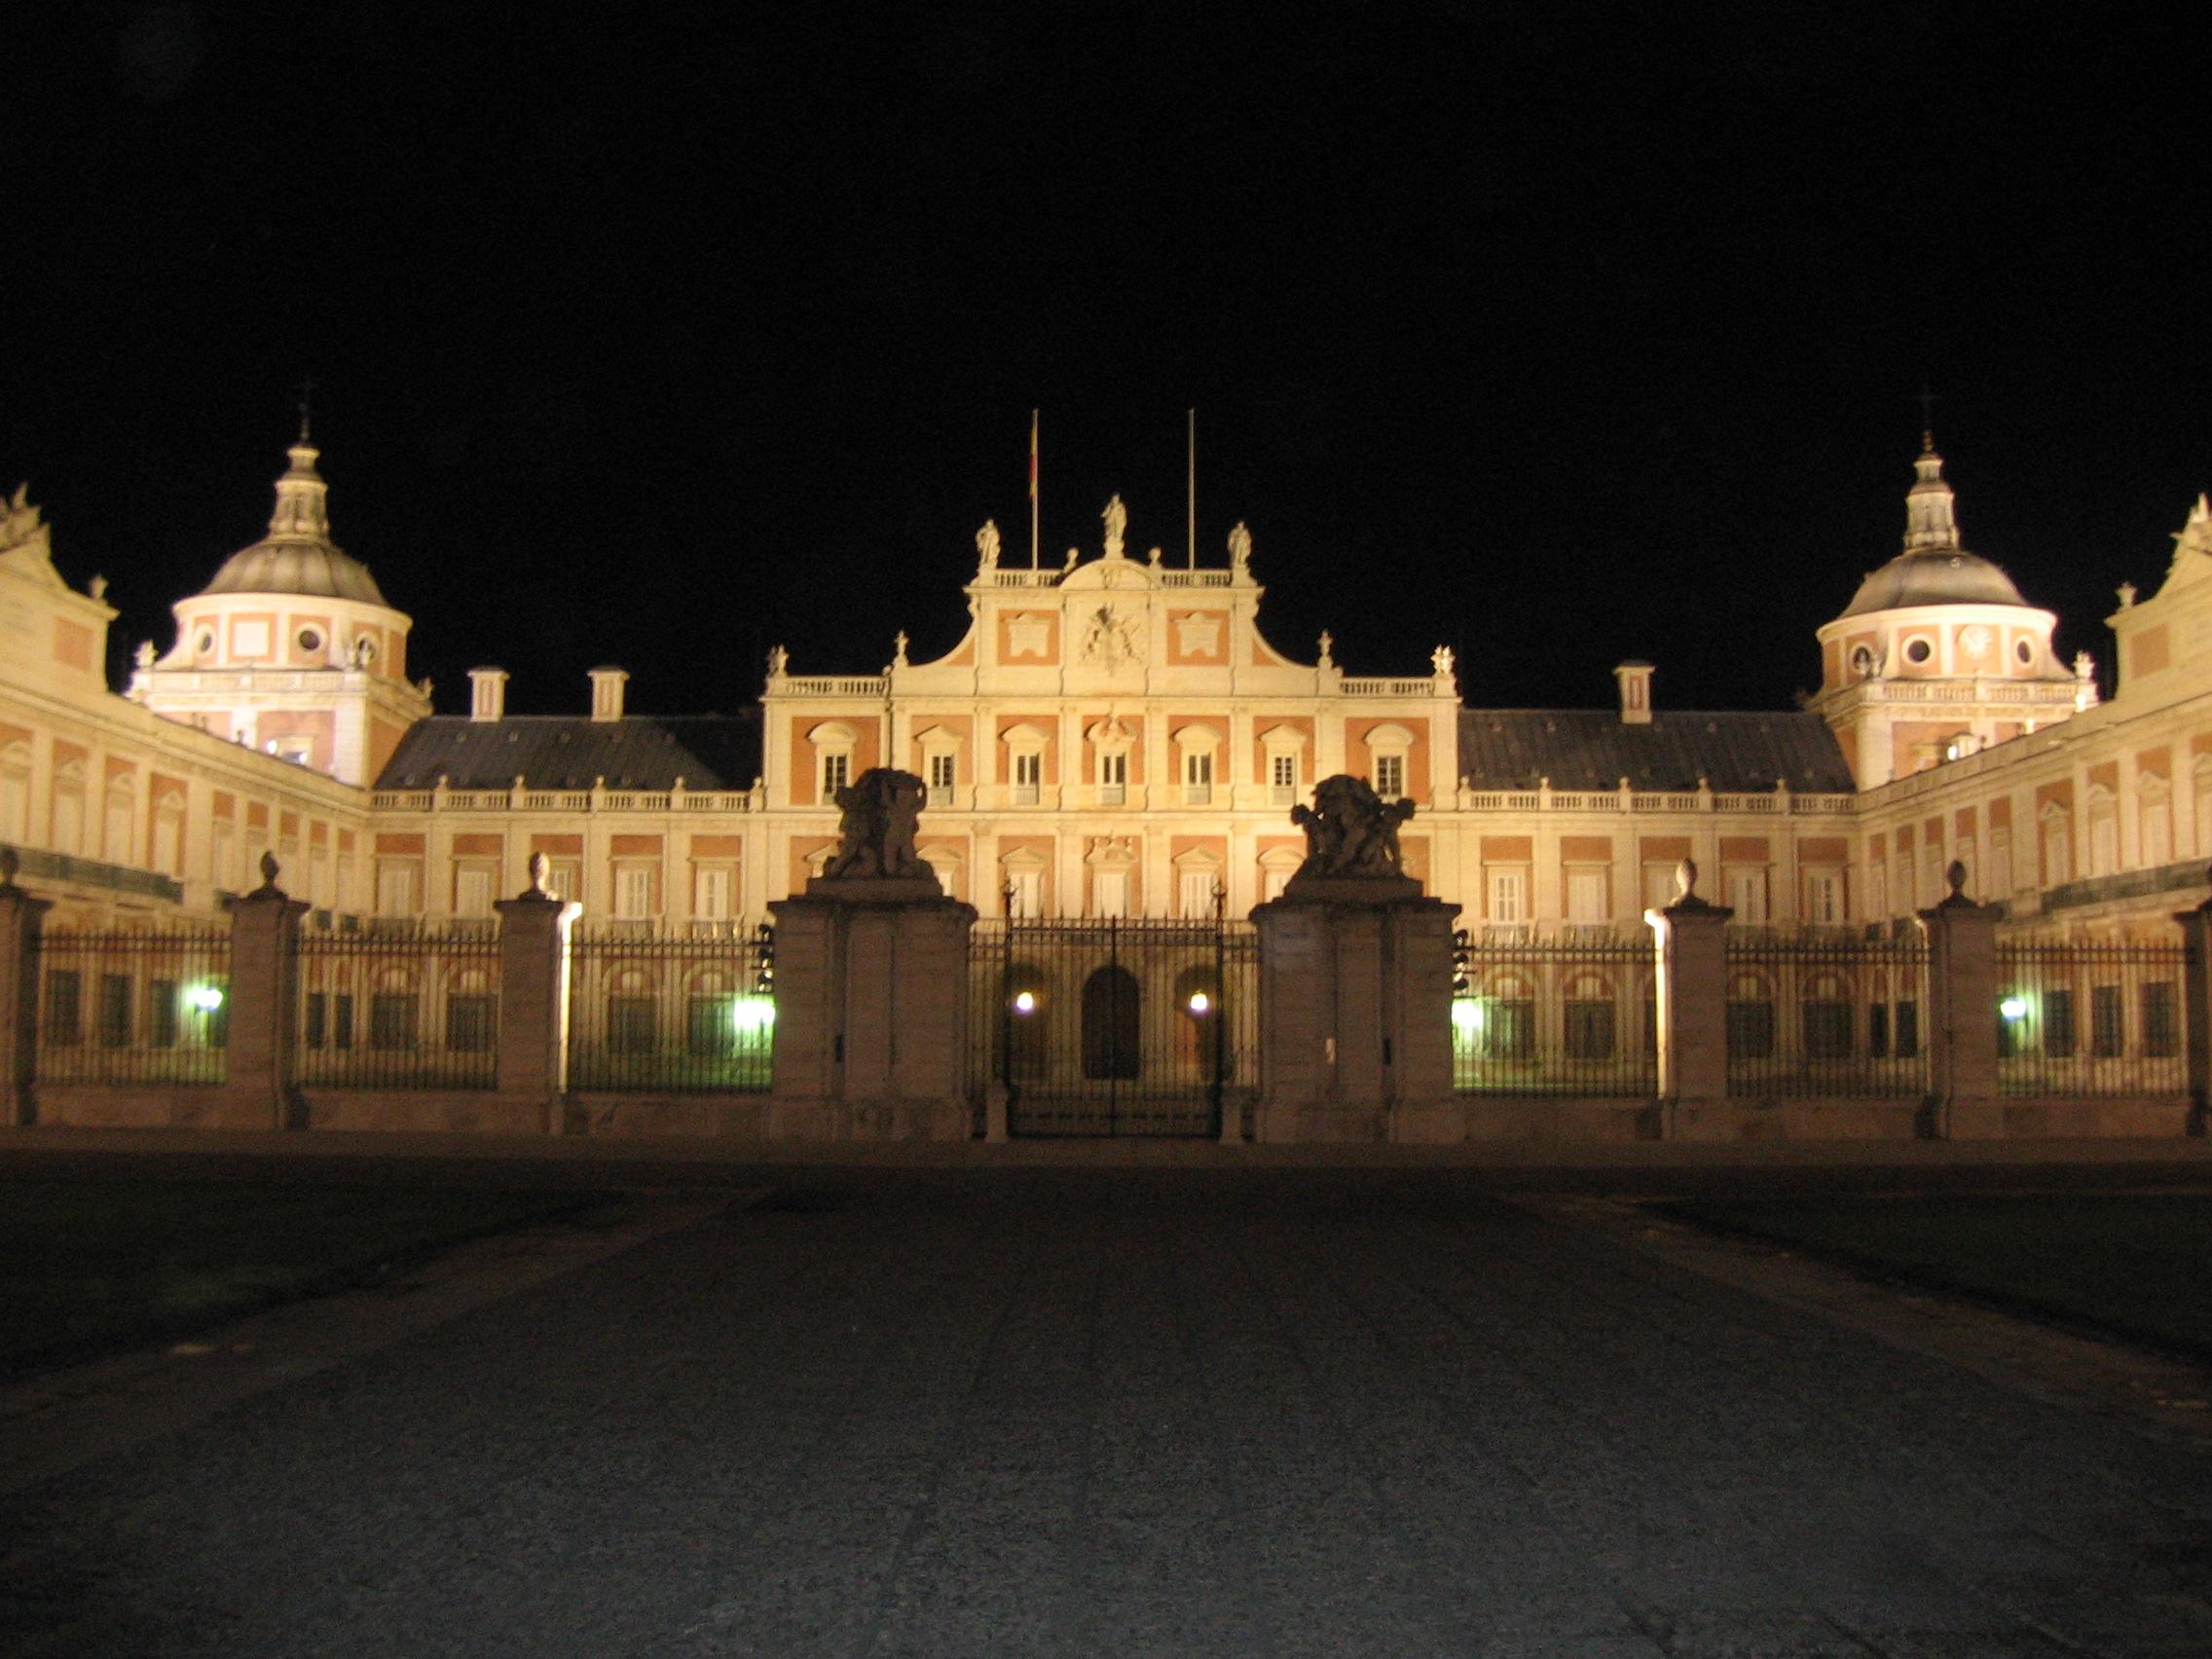 http://upload.wikimedia.org/wikipedia/commons/6/60/Aranjuez_Palacio_De_Noche.jpg